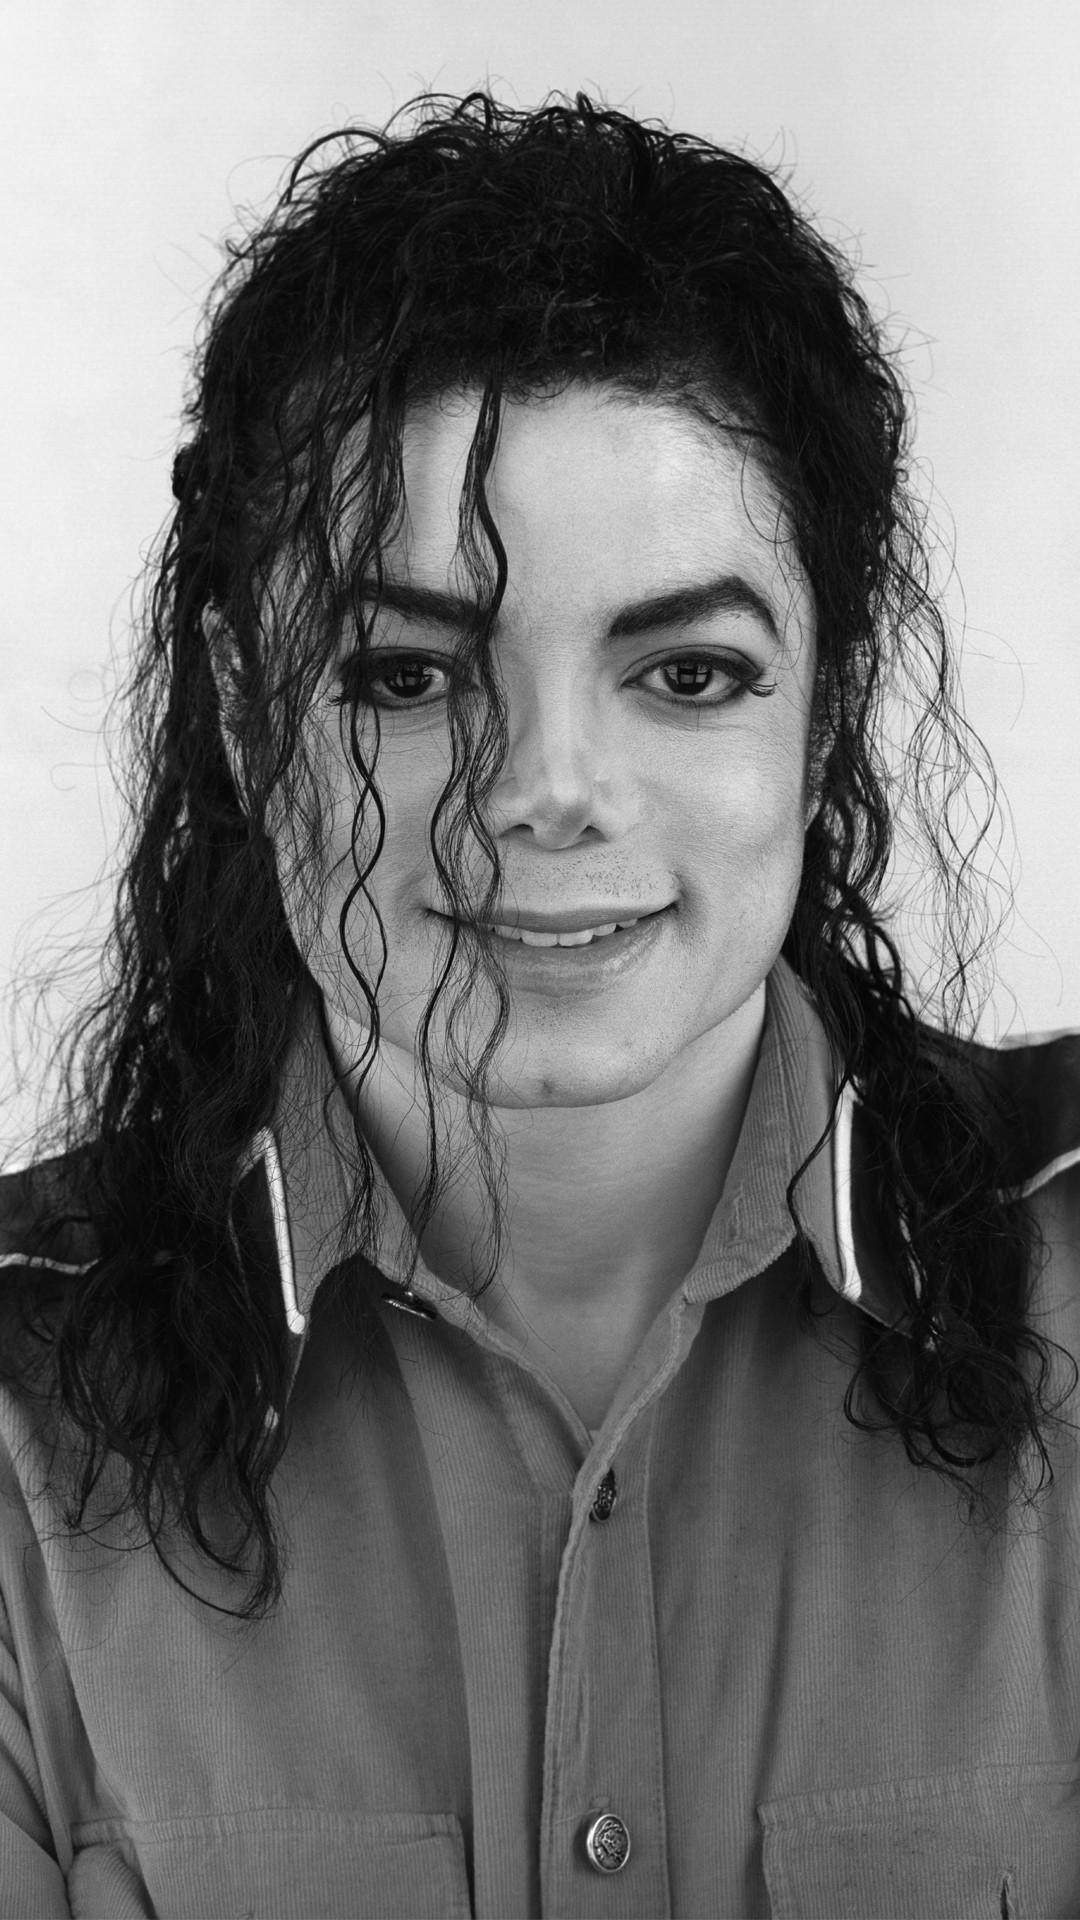 Iphone Wallpaper Michael Jackson Michael Jackson 4k Wallpapers Hd Wallpapers Id 19708